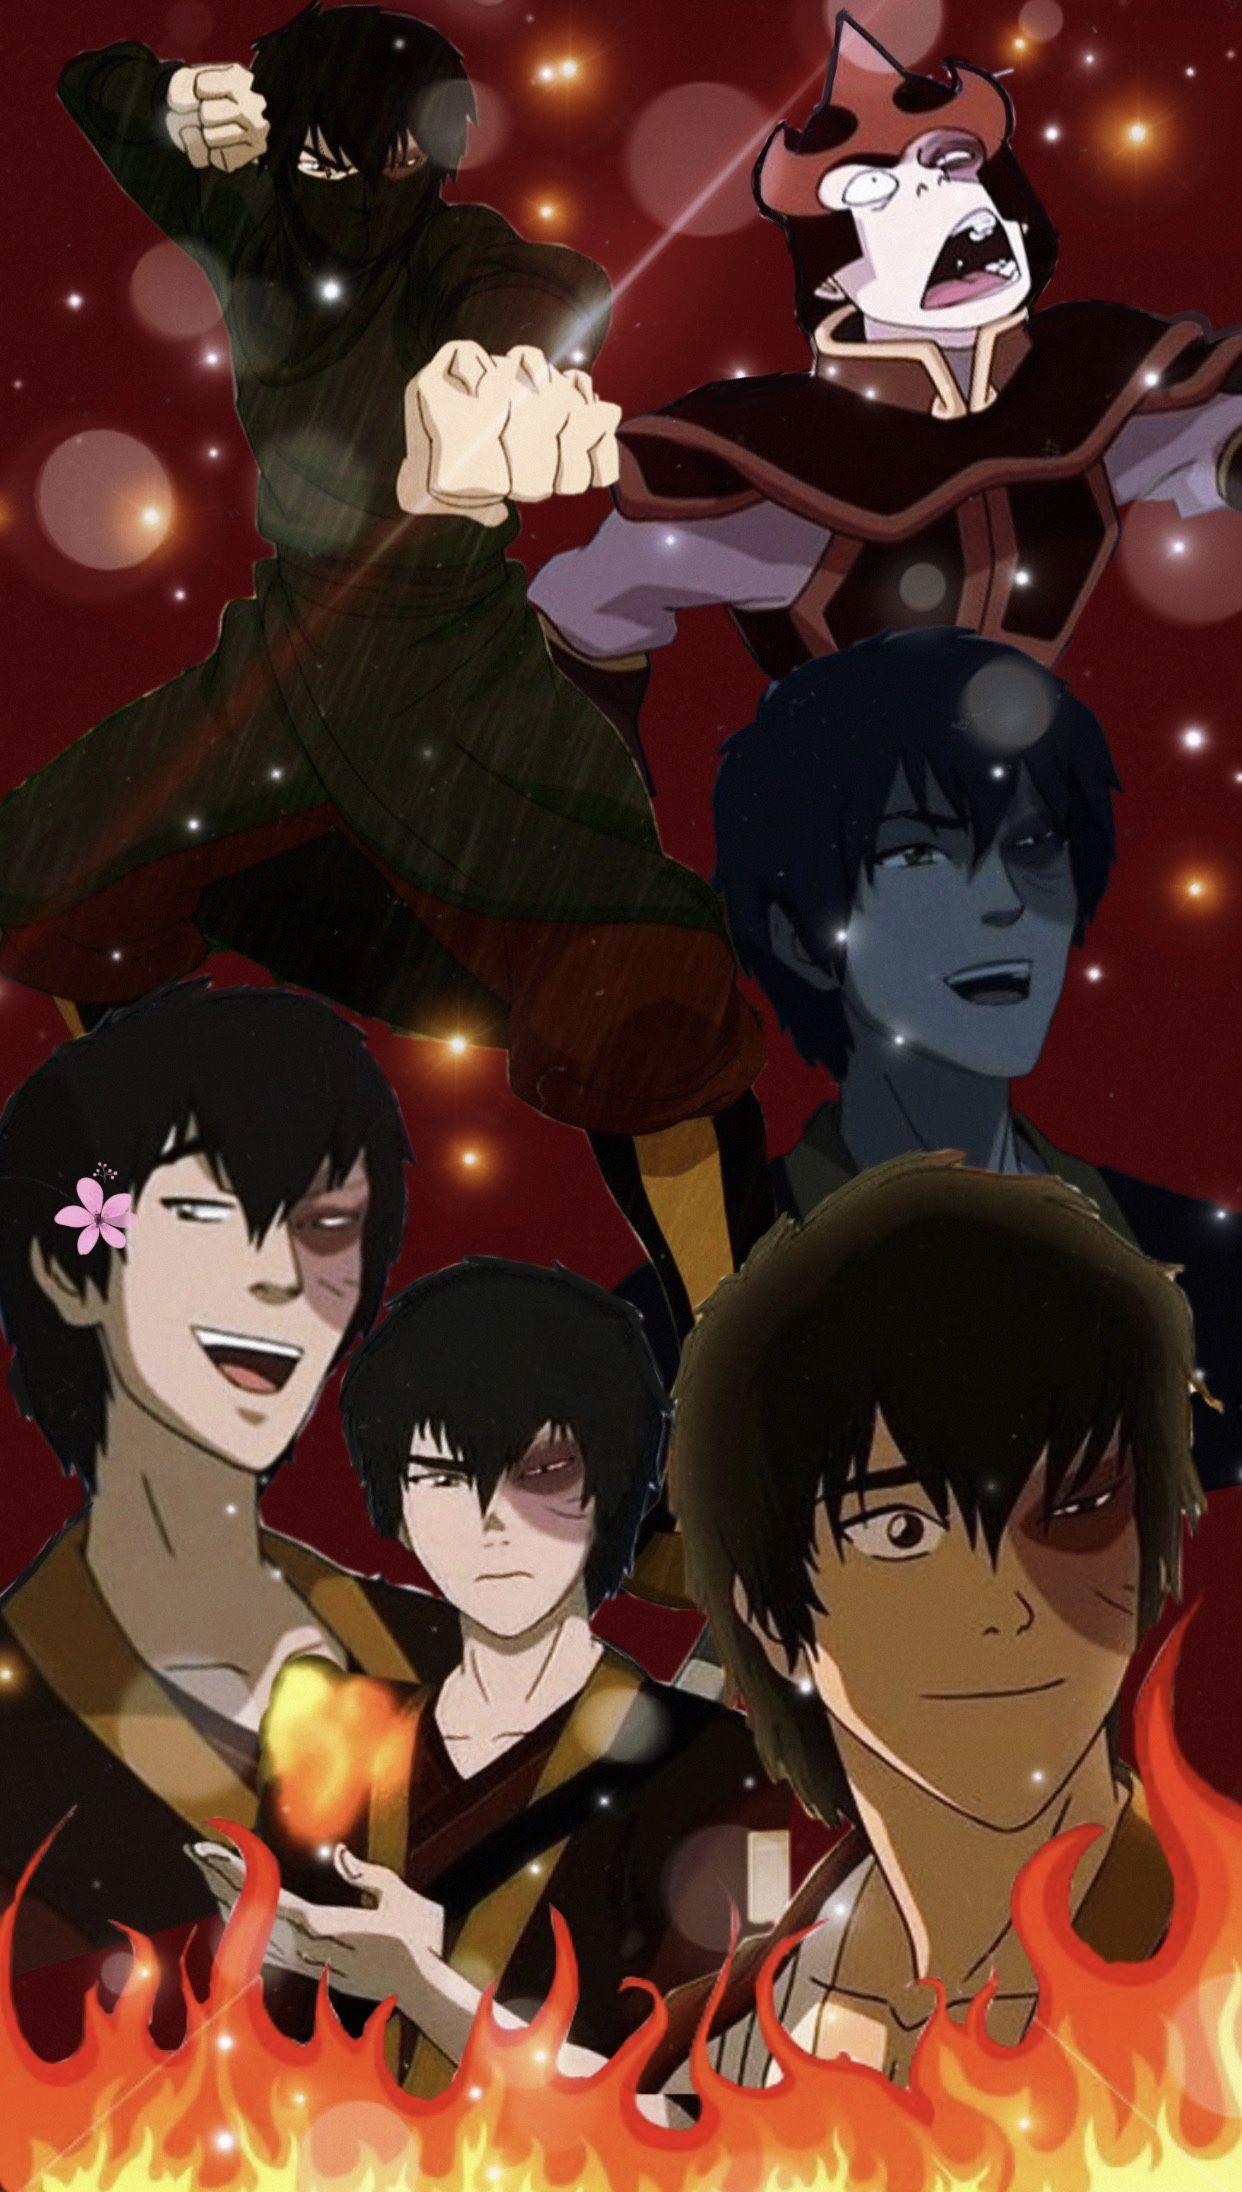 prince zuko iphone wallpaper in 2020 Avatar the last